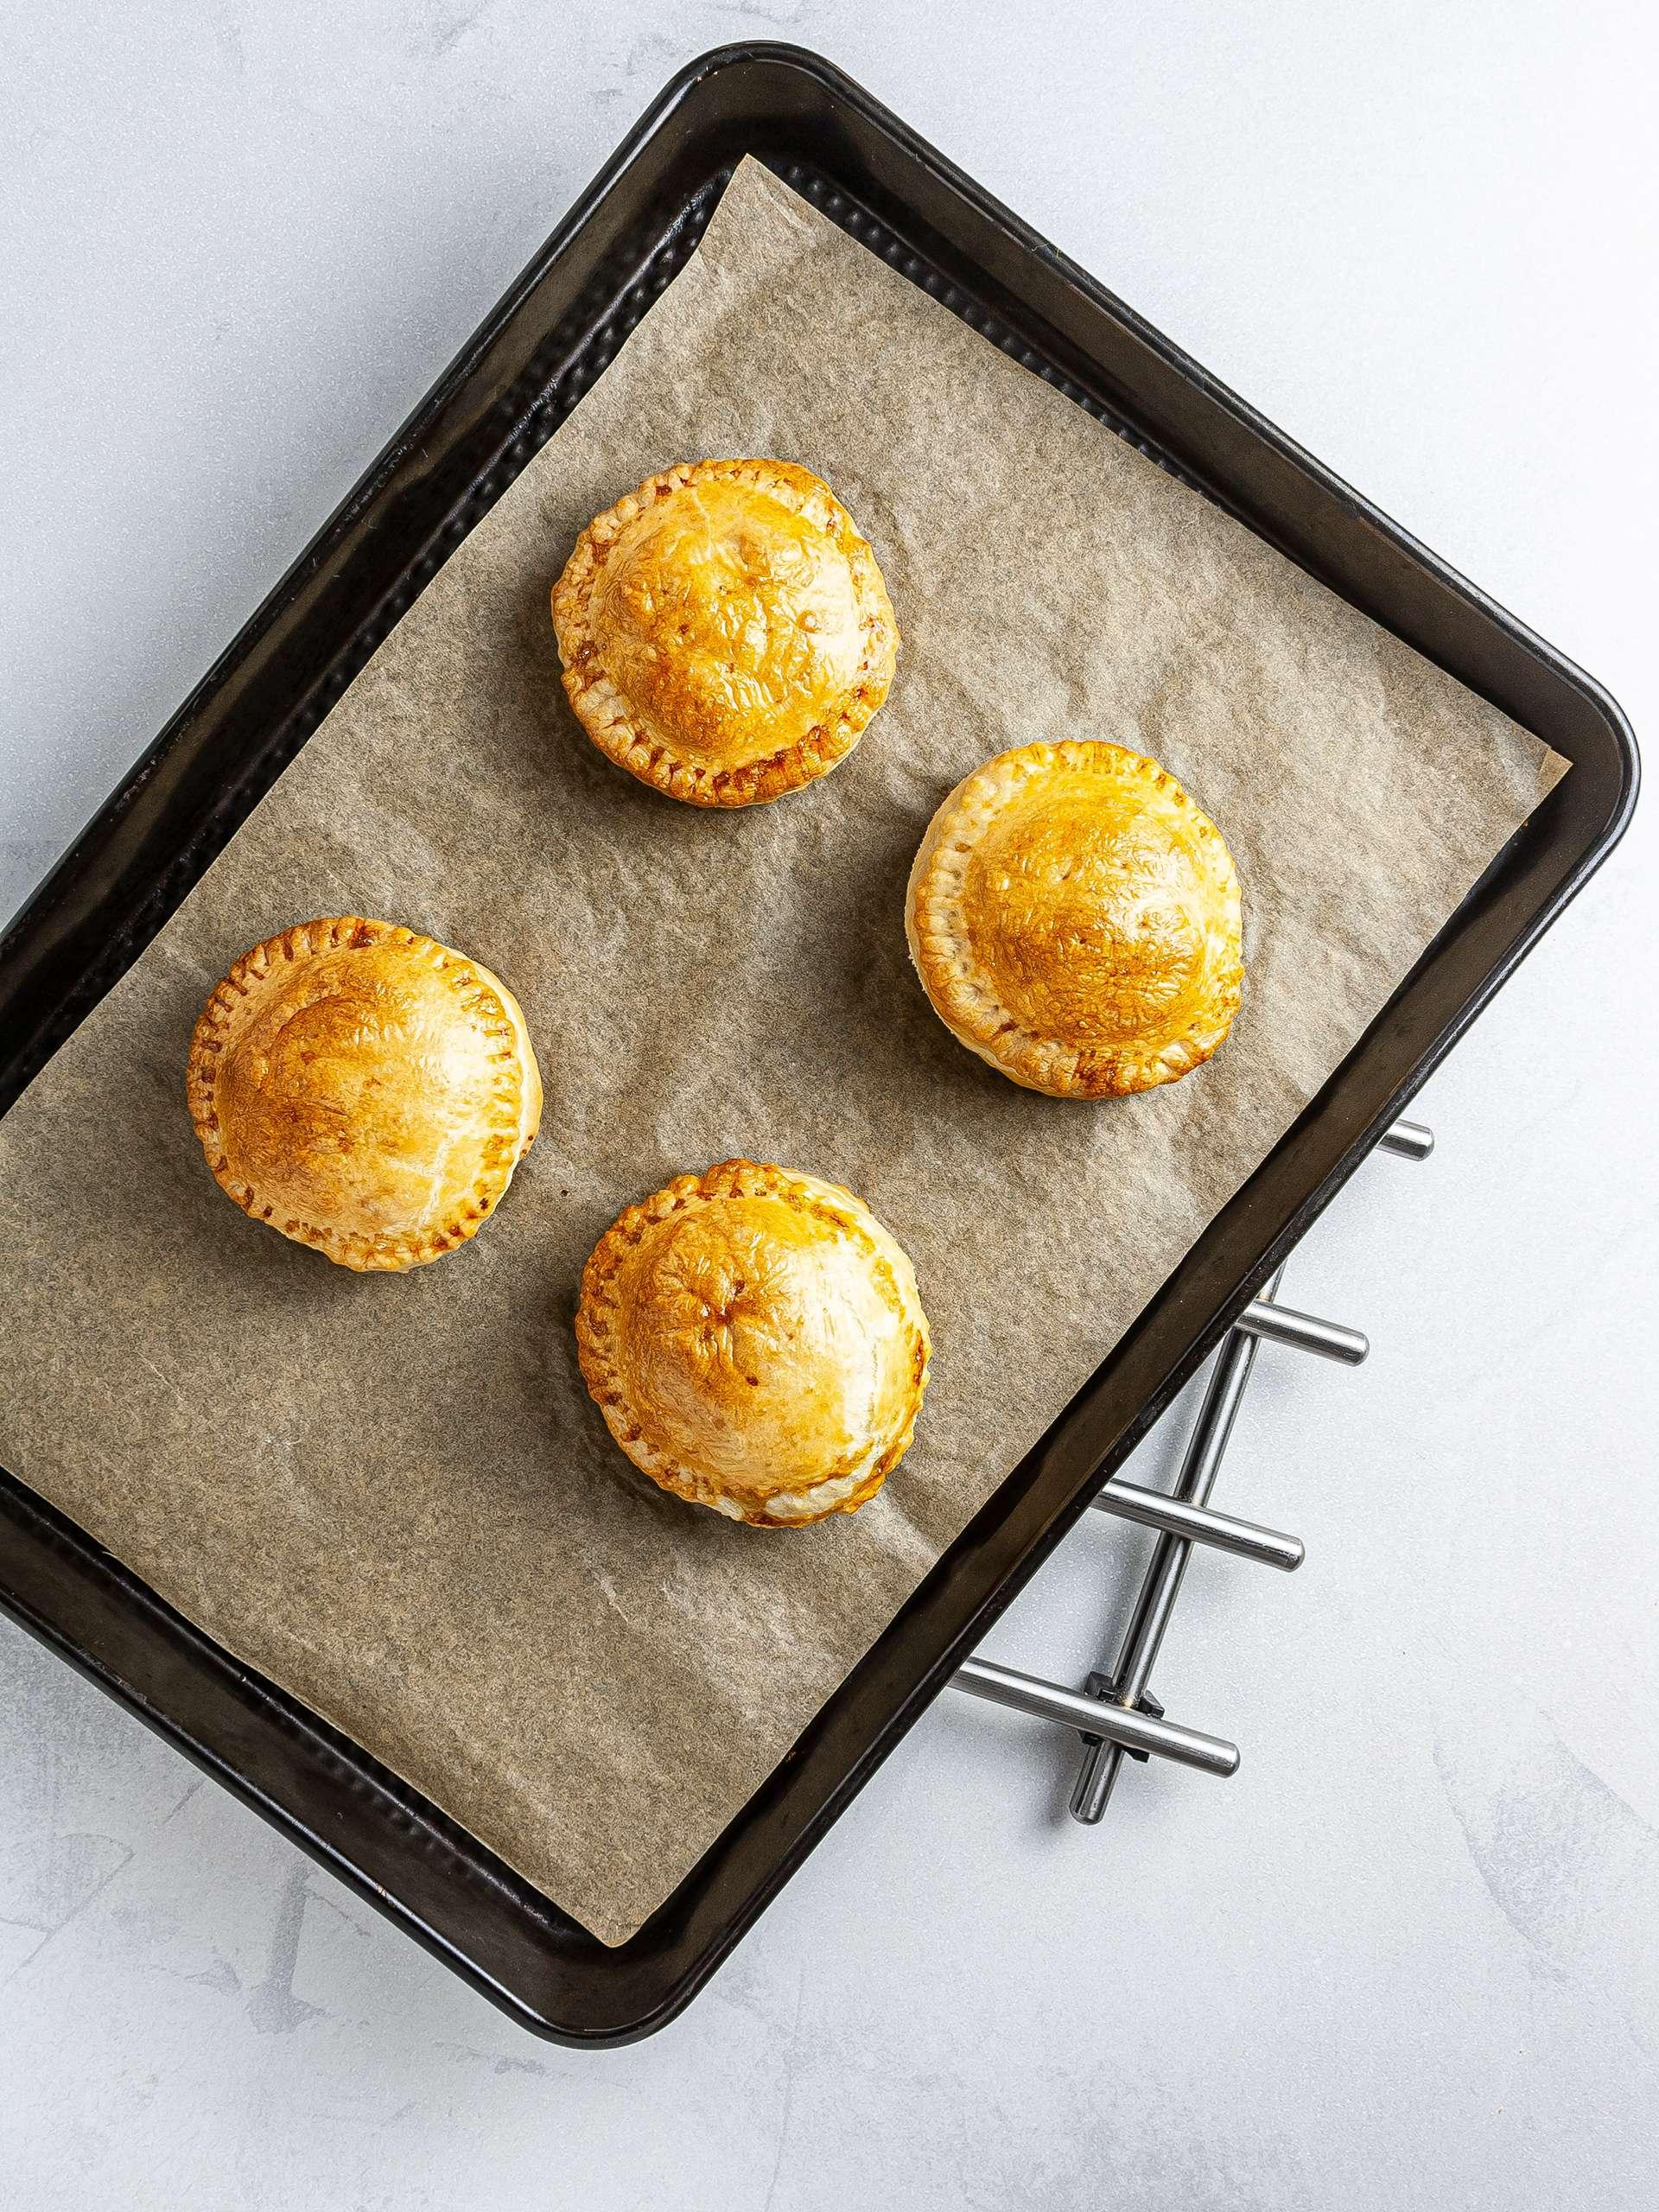 Bake pate chaud pastries